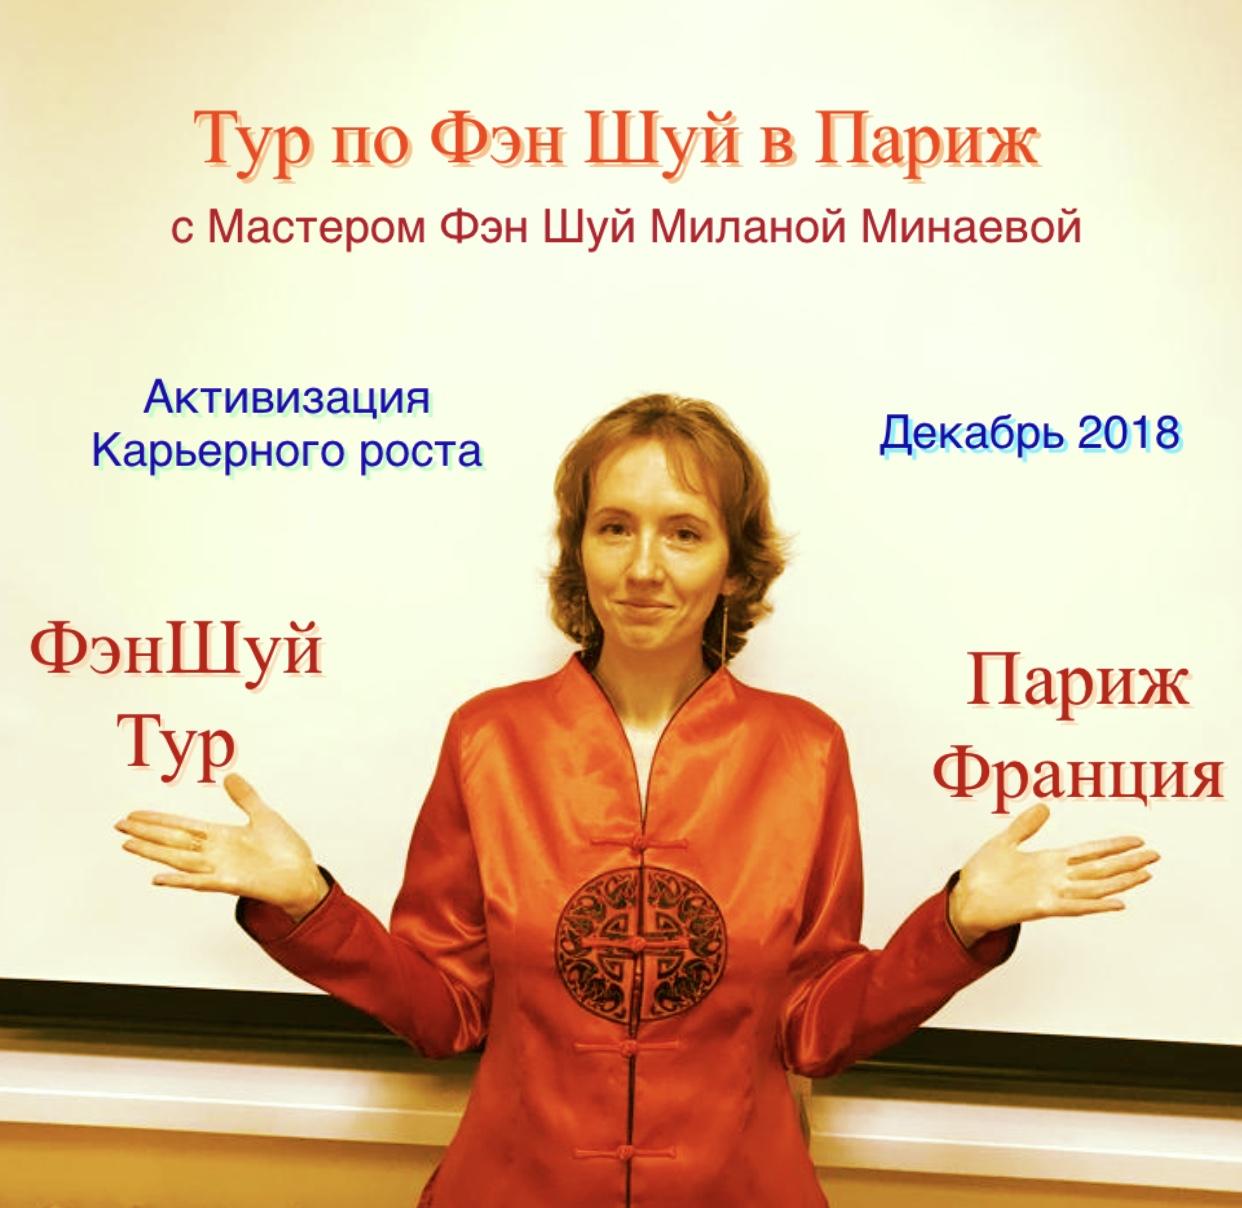 Милана Минаева - Фэншуй-тур - Milana.Ru